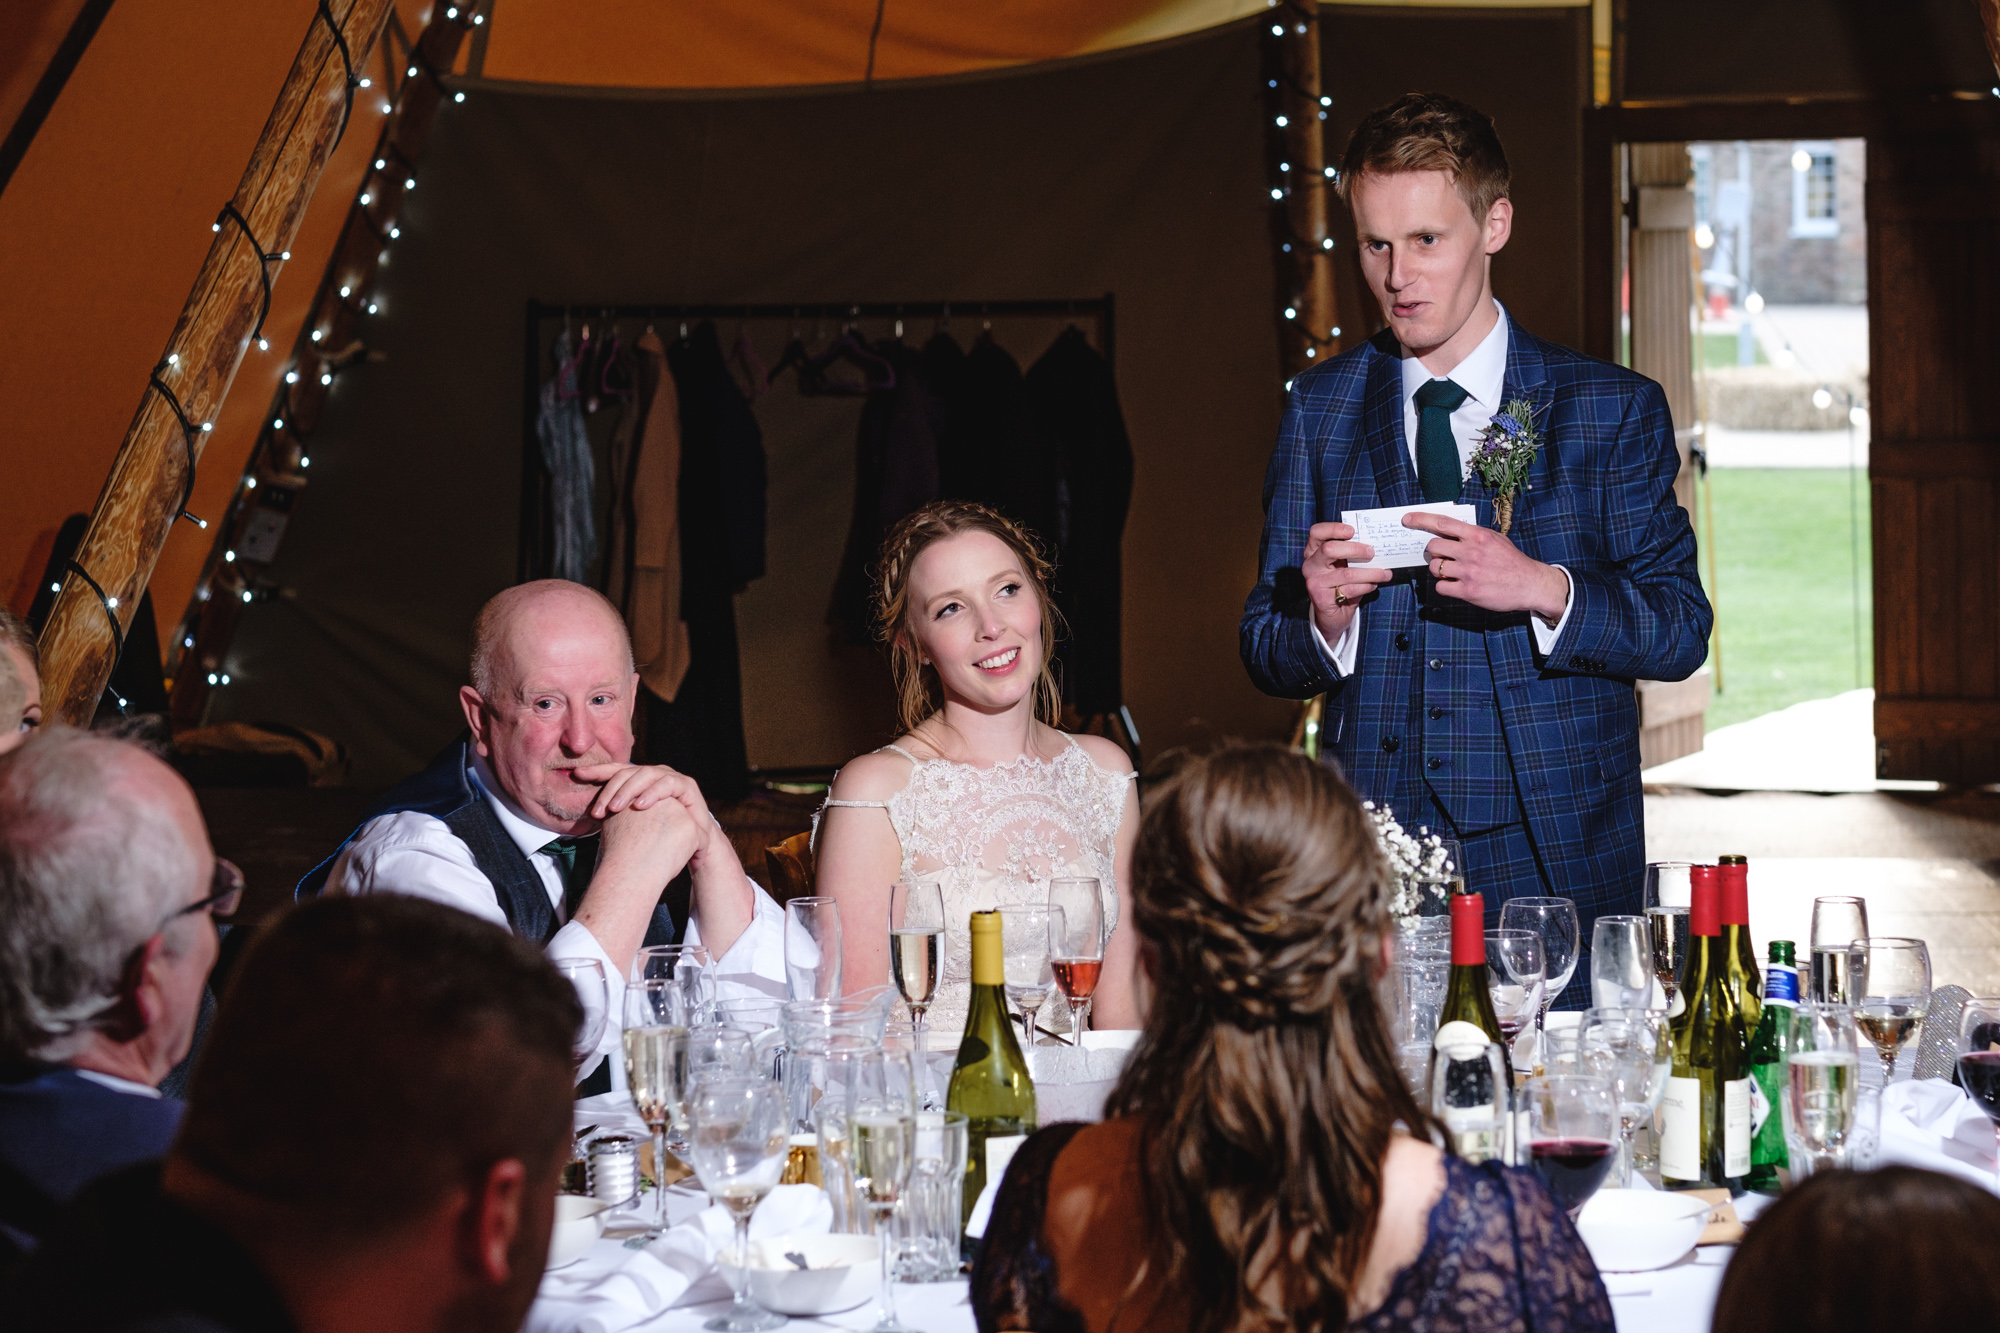 Katie and Dode weddings (167 of 207).jpg